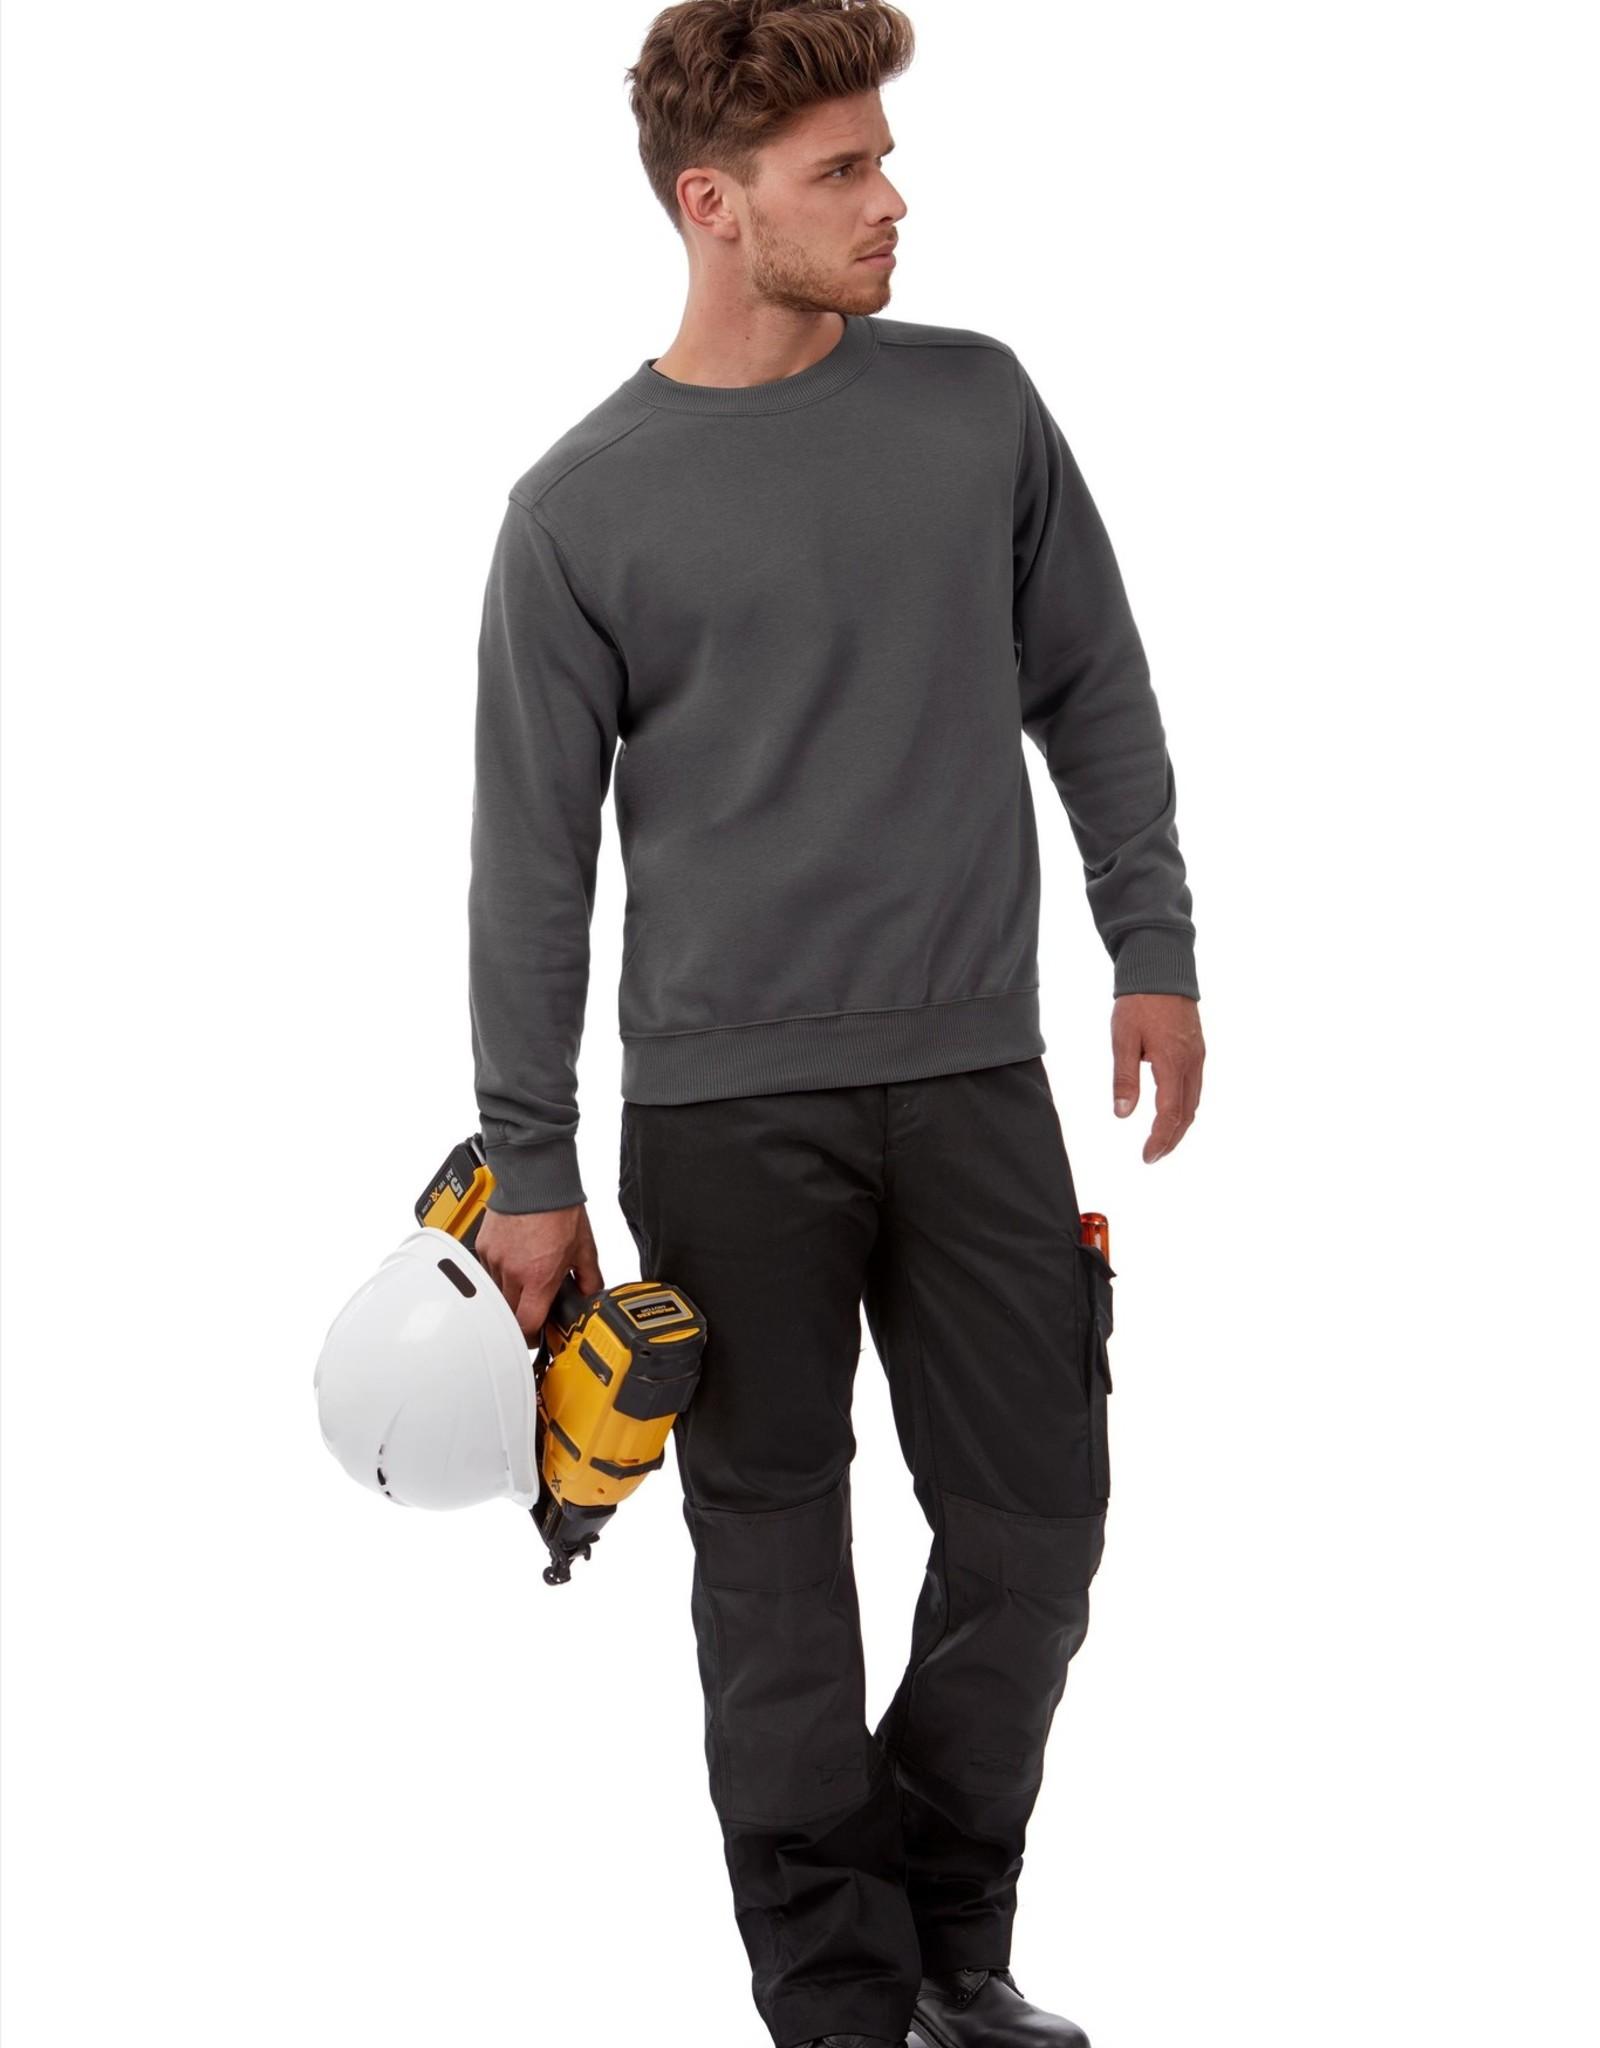 B&C Workwear set-in SWEATER antraciet